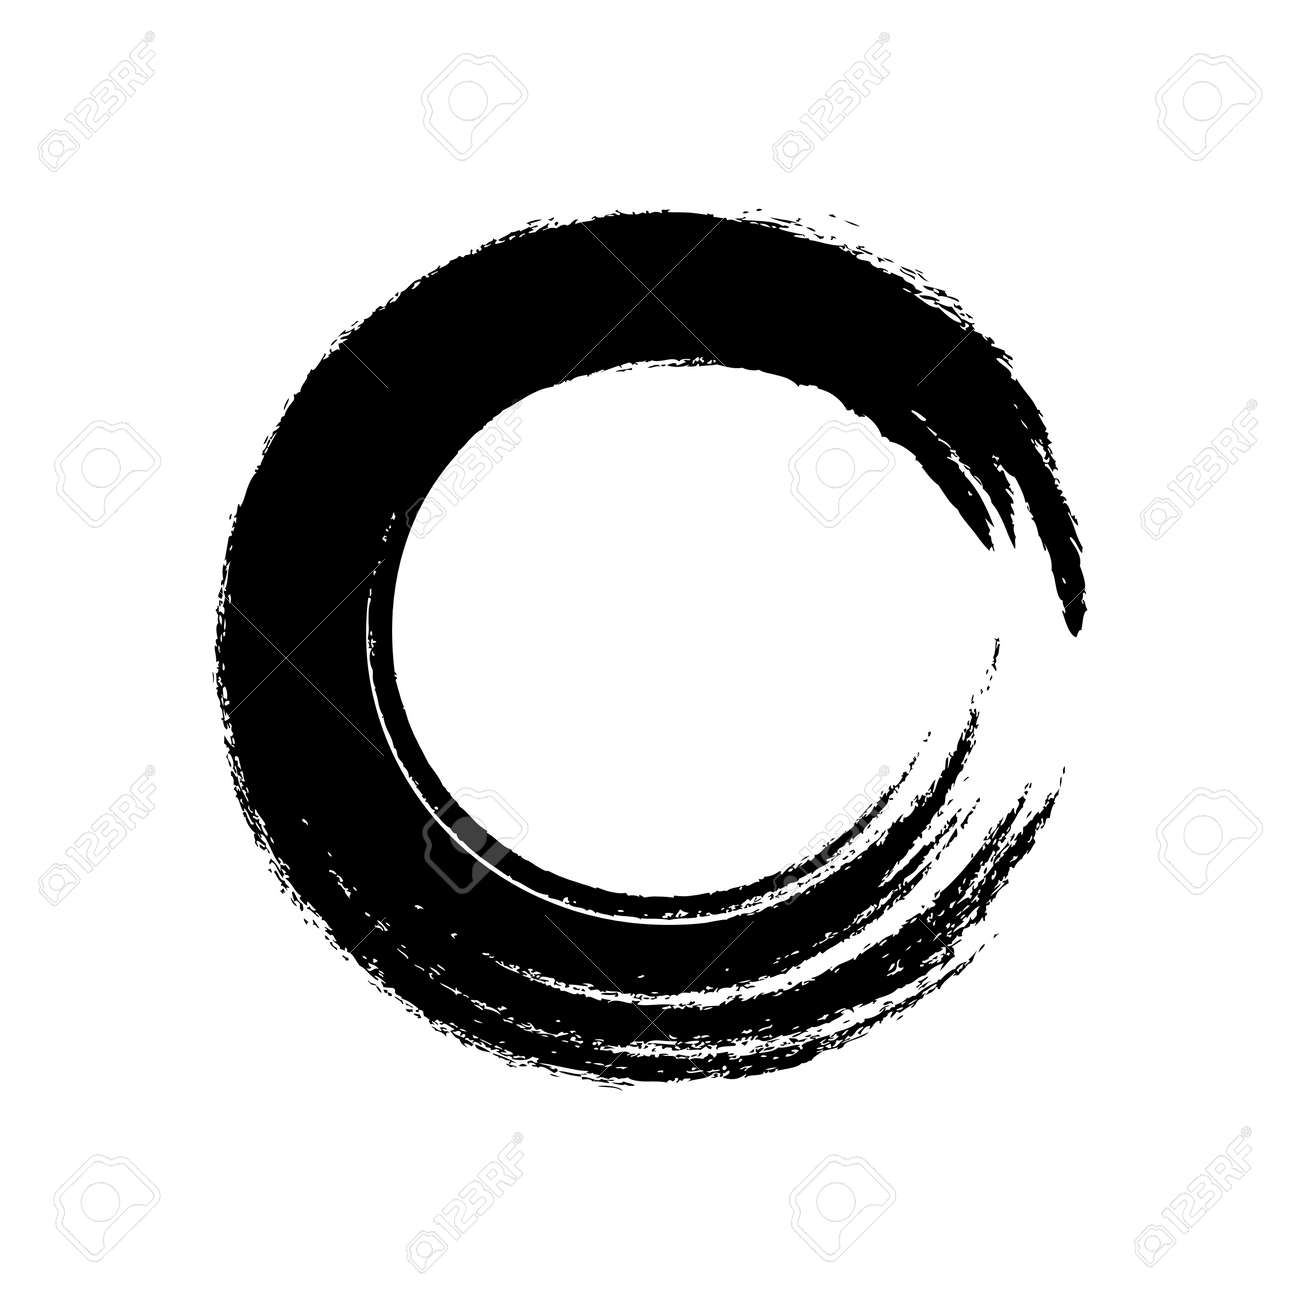 black circle brush enso symbol, smear circle shape with scribble hand drawn, ink dirty stain black on white, paint stripe brush strokes circle symbol - 169183478